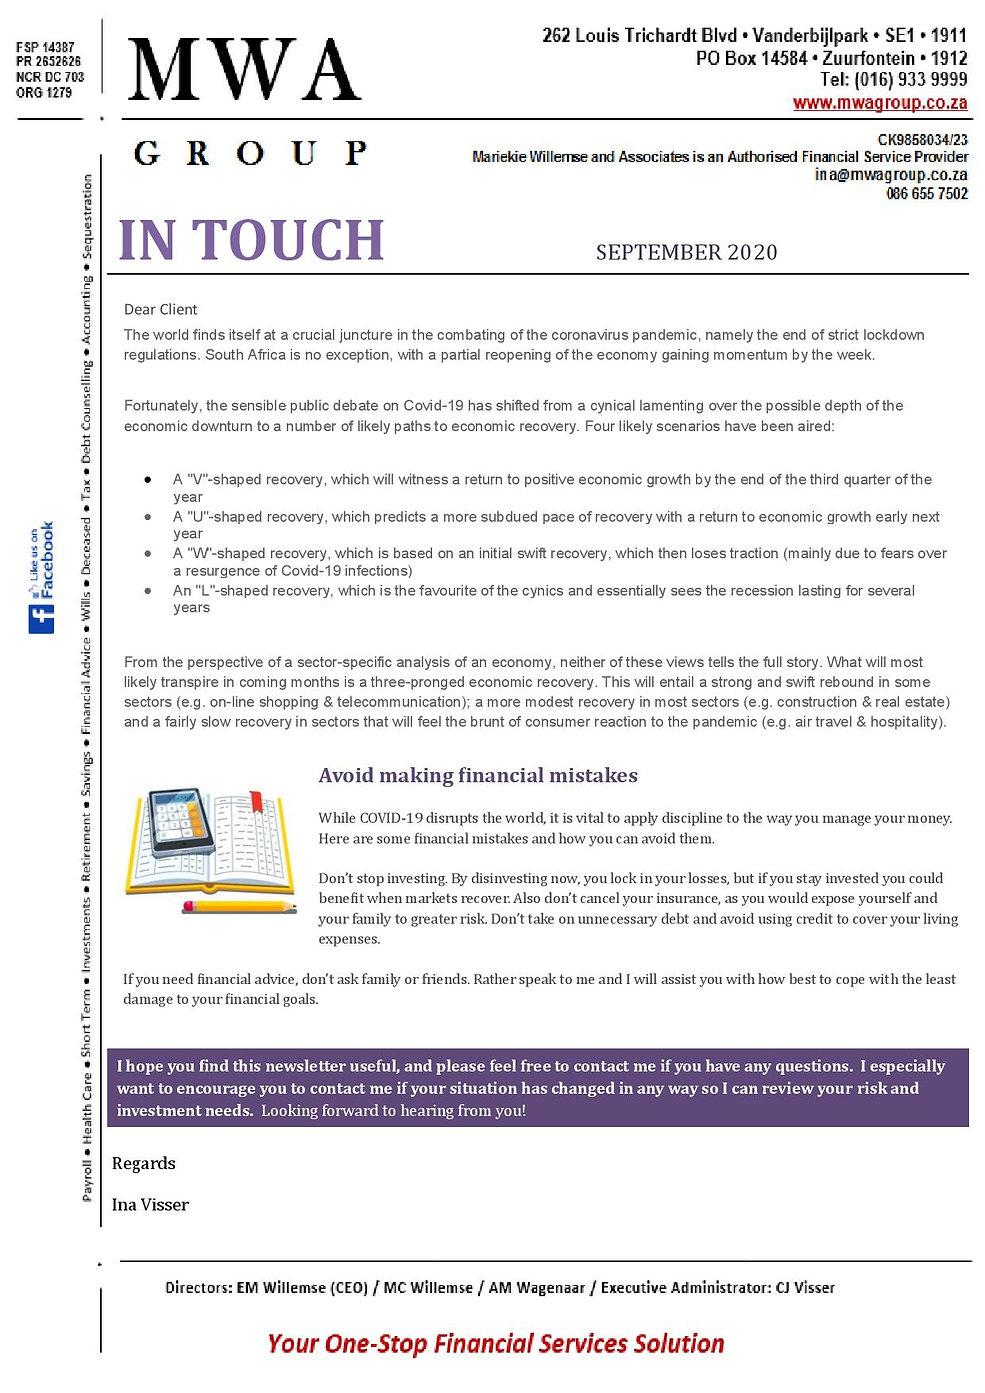 News letter Sept 2020-page-001.jpg